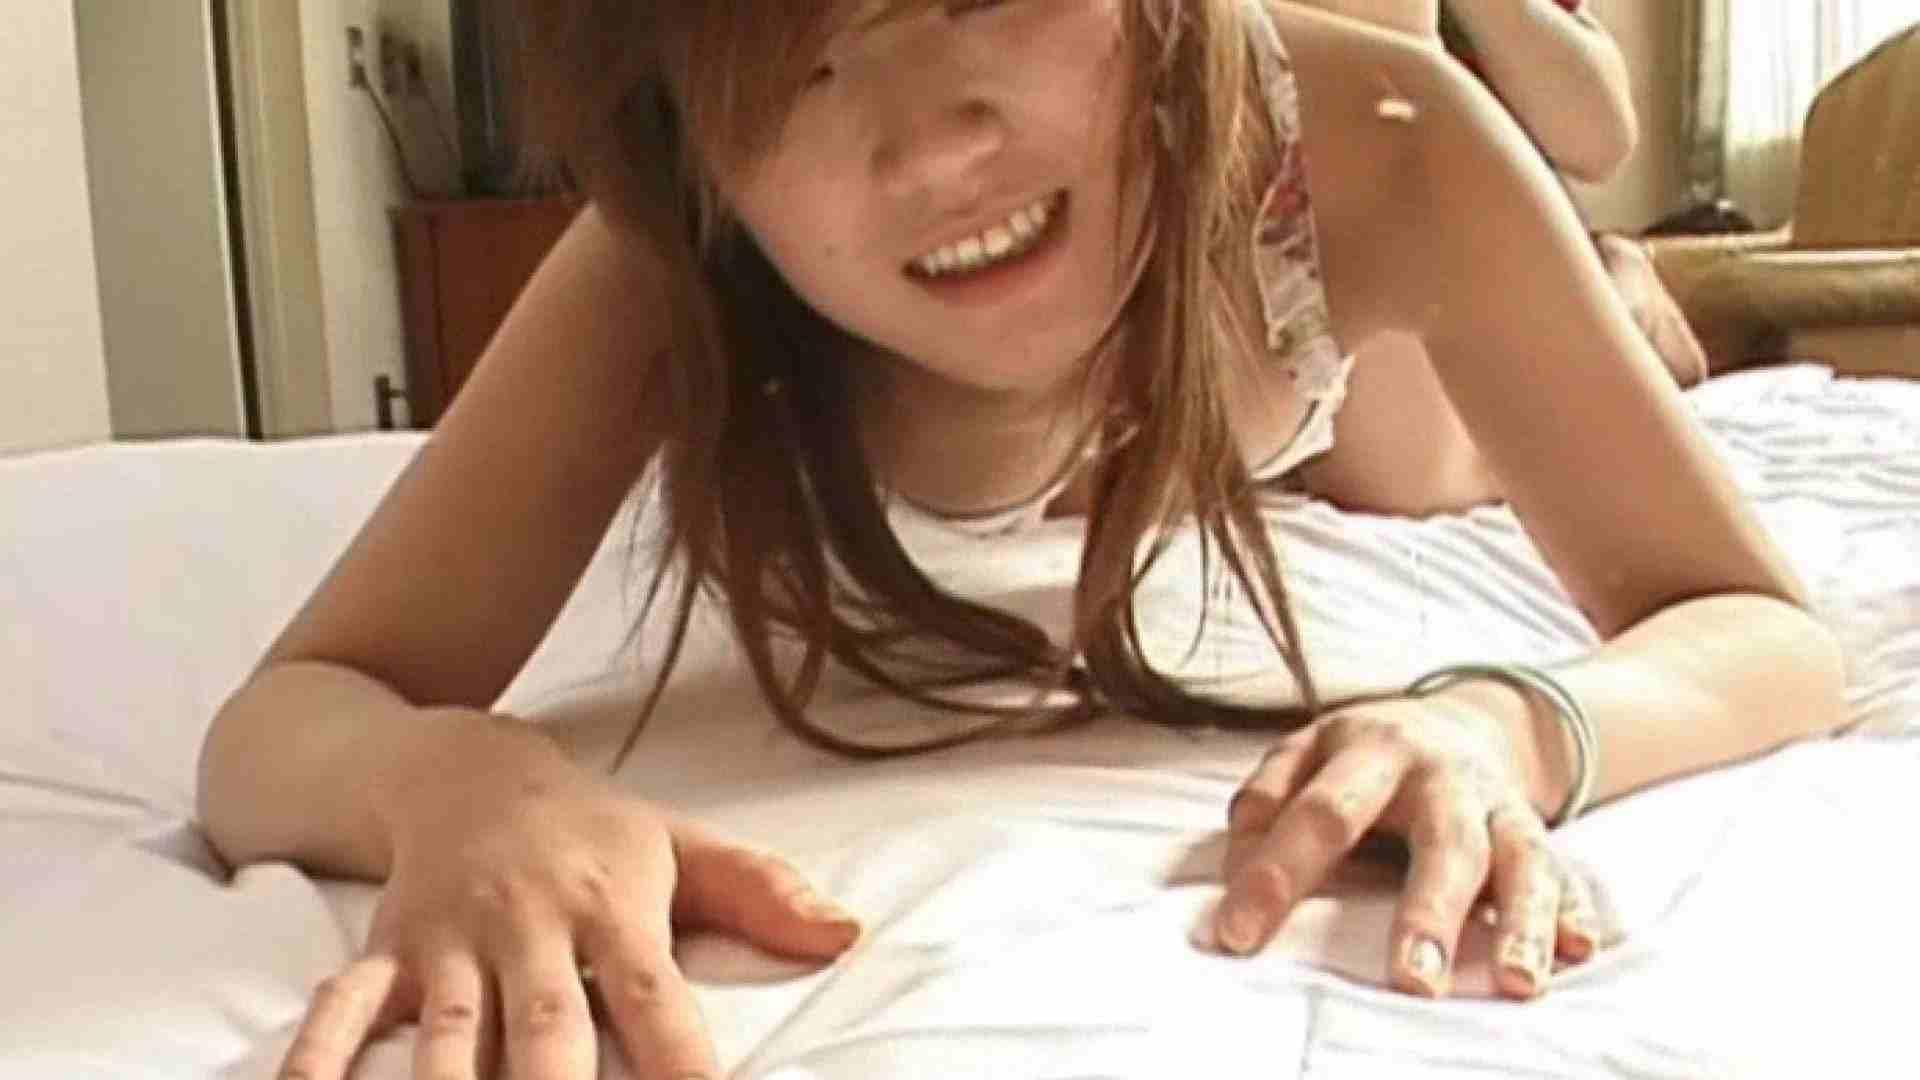 S級厳選美女ビッチガールVol.53 美女  95連発 64